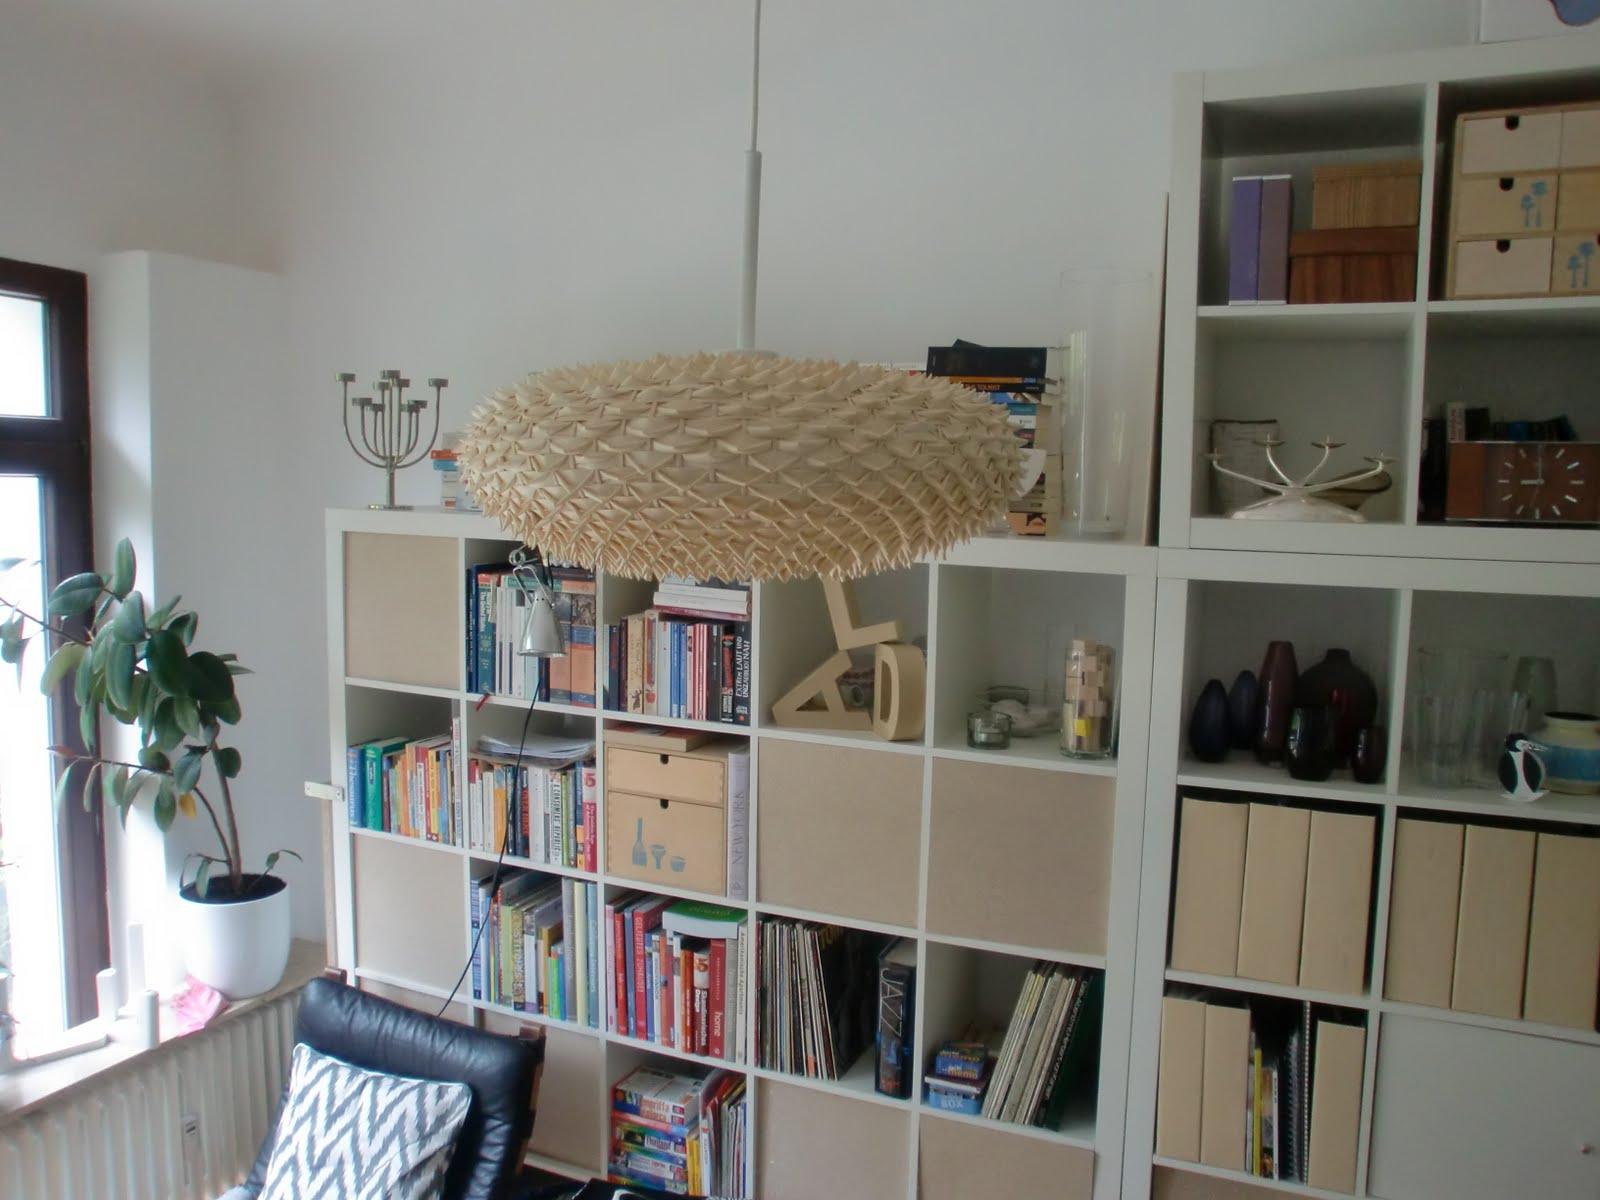 litenbjoern lieblingsst cke skandinavisches design ii. Black Bedroom Furniture Sets. Home Design Ideas